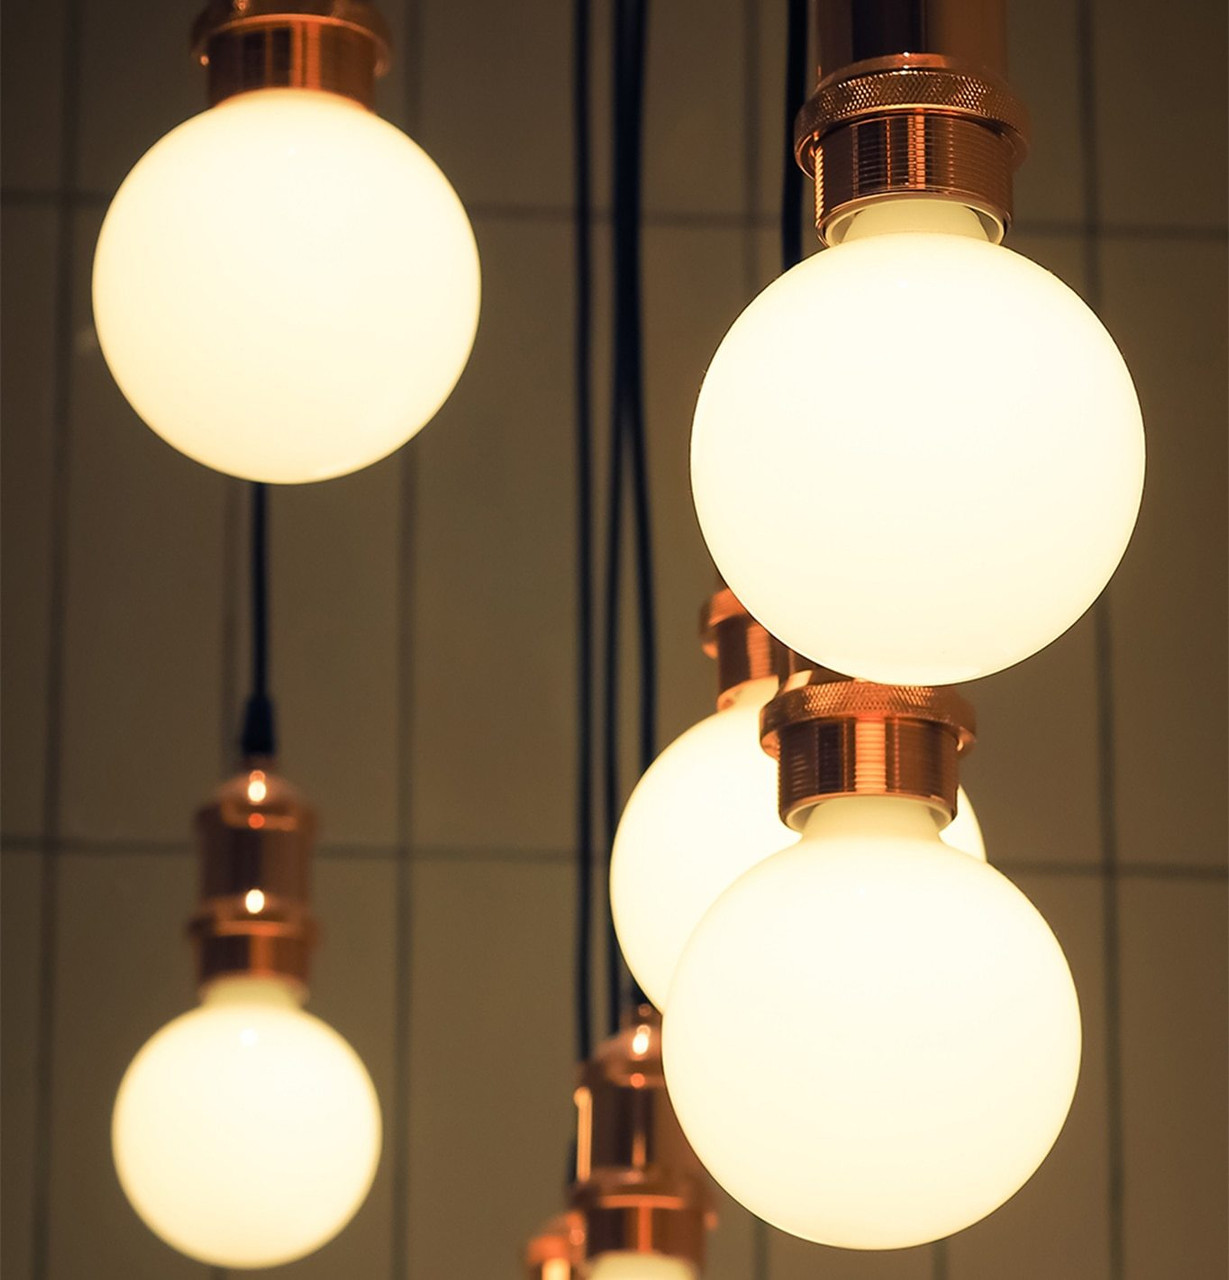 Crompton Lamps LED G80 2200K Light Bulbs